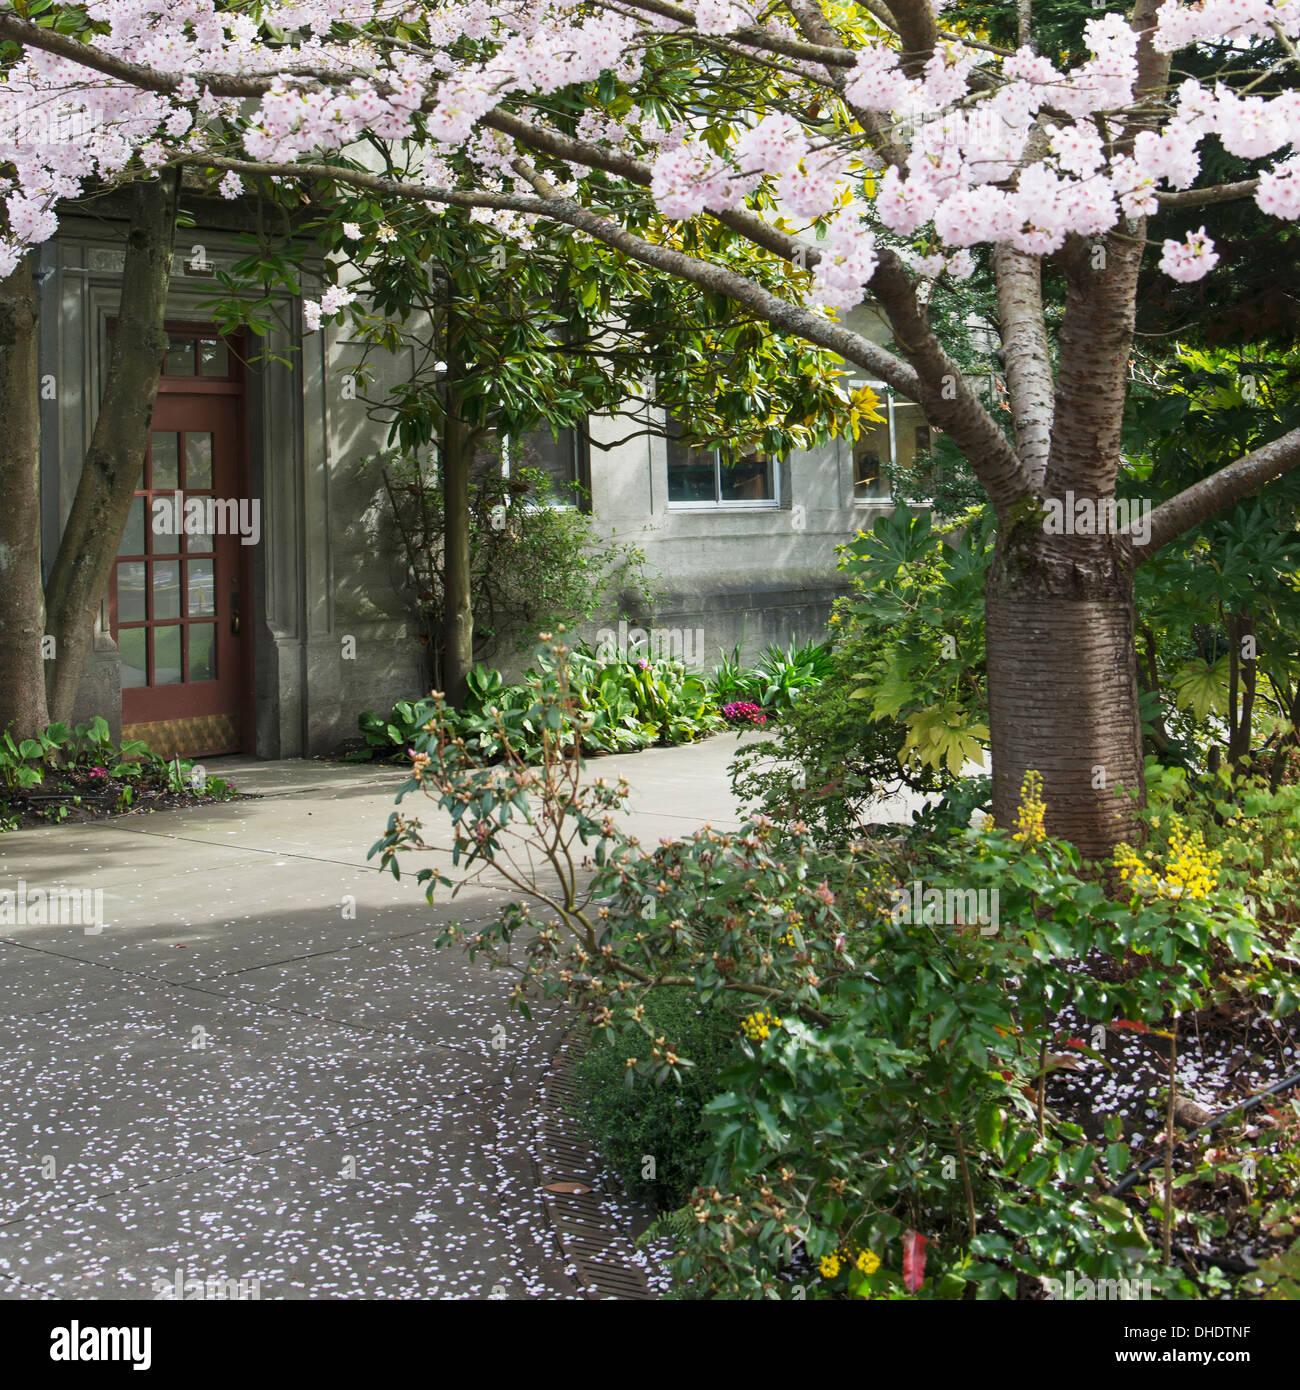 Hiram M. Chittenden Locks And Carl S. English Jr. Botanical Gardens; Seattle,  Washington, United States Of America